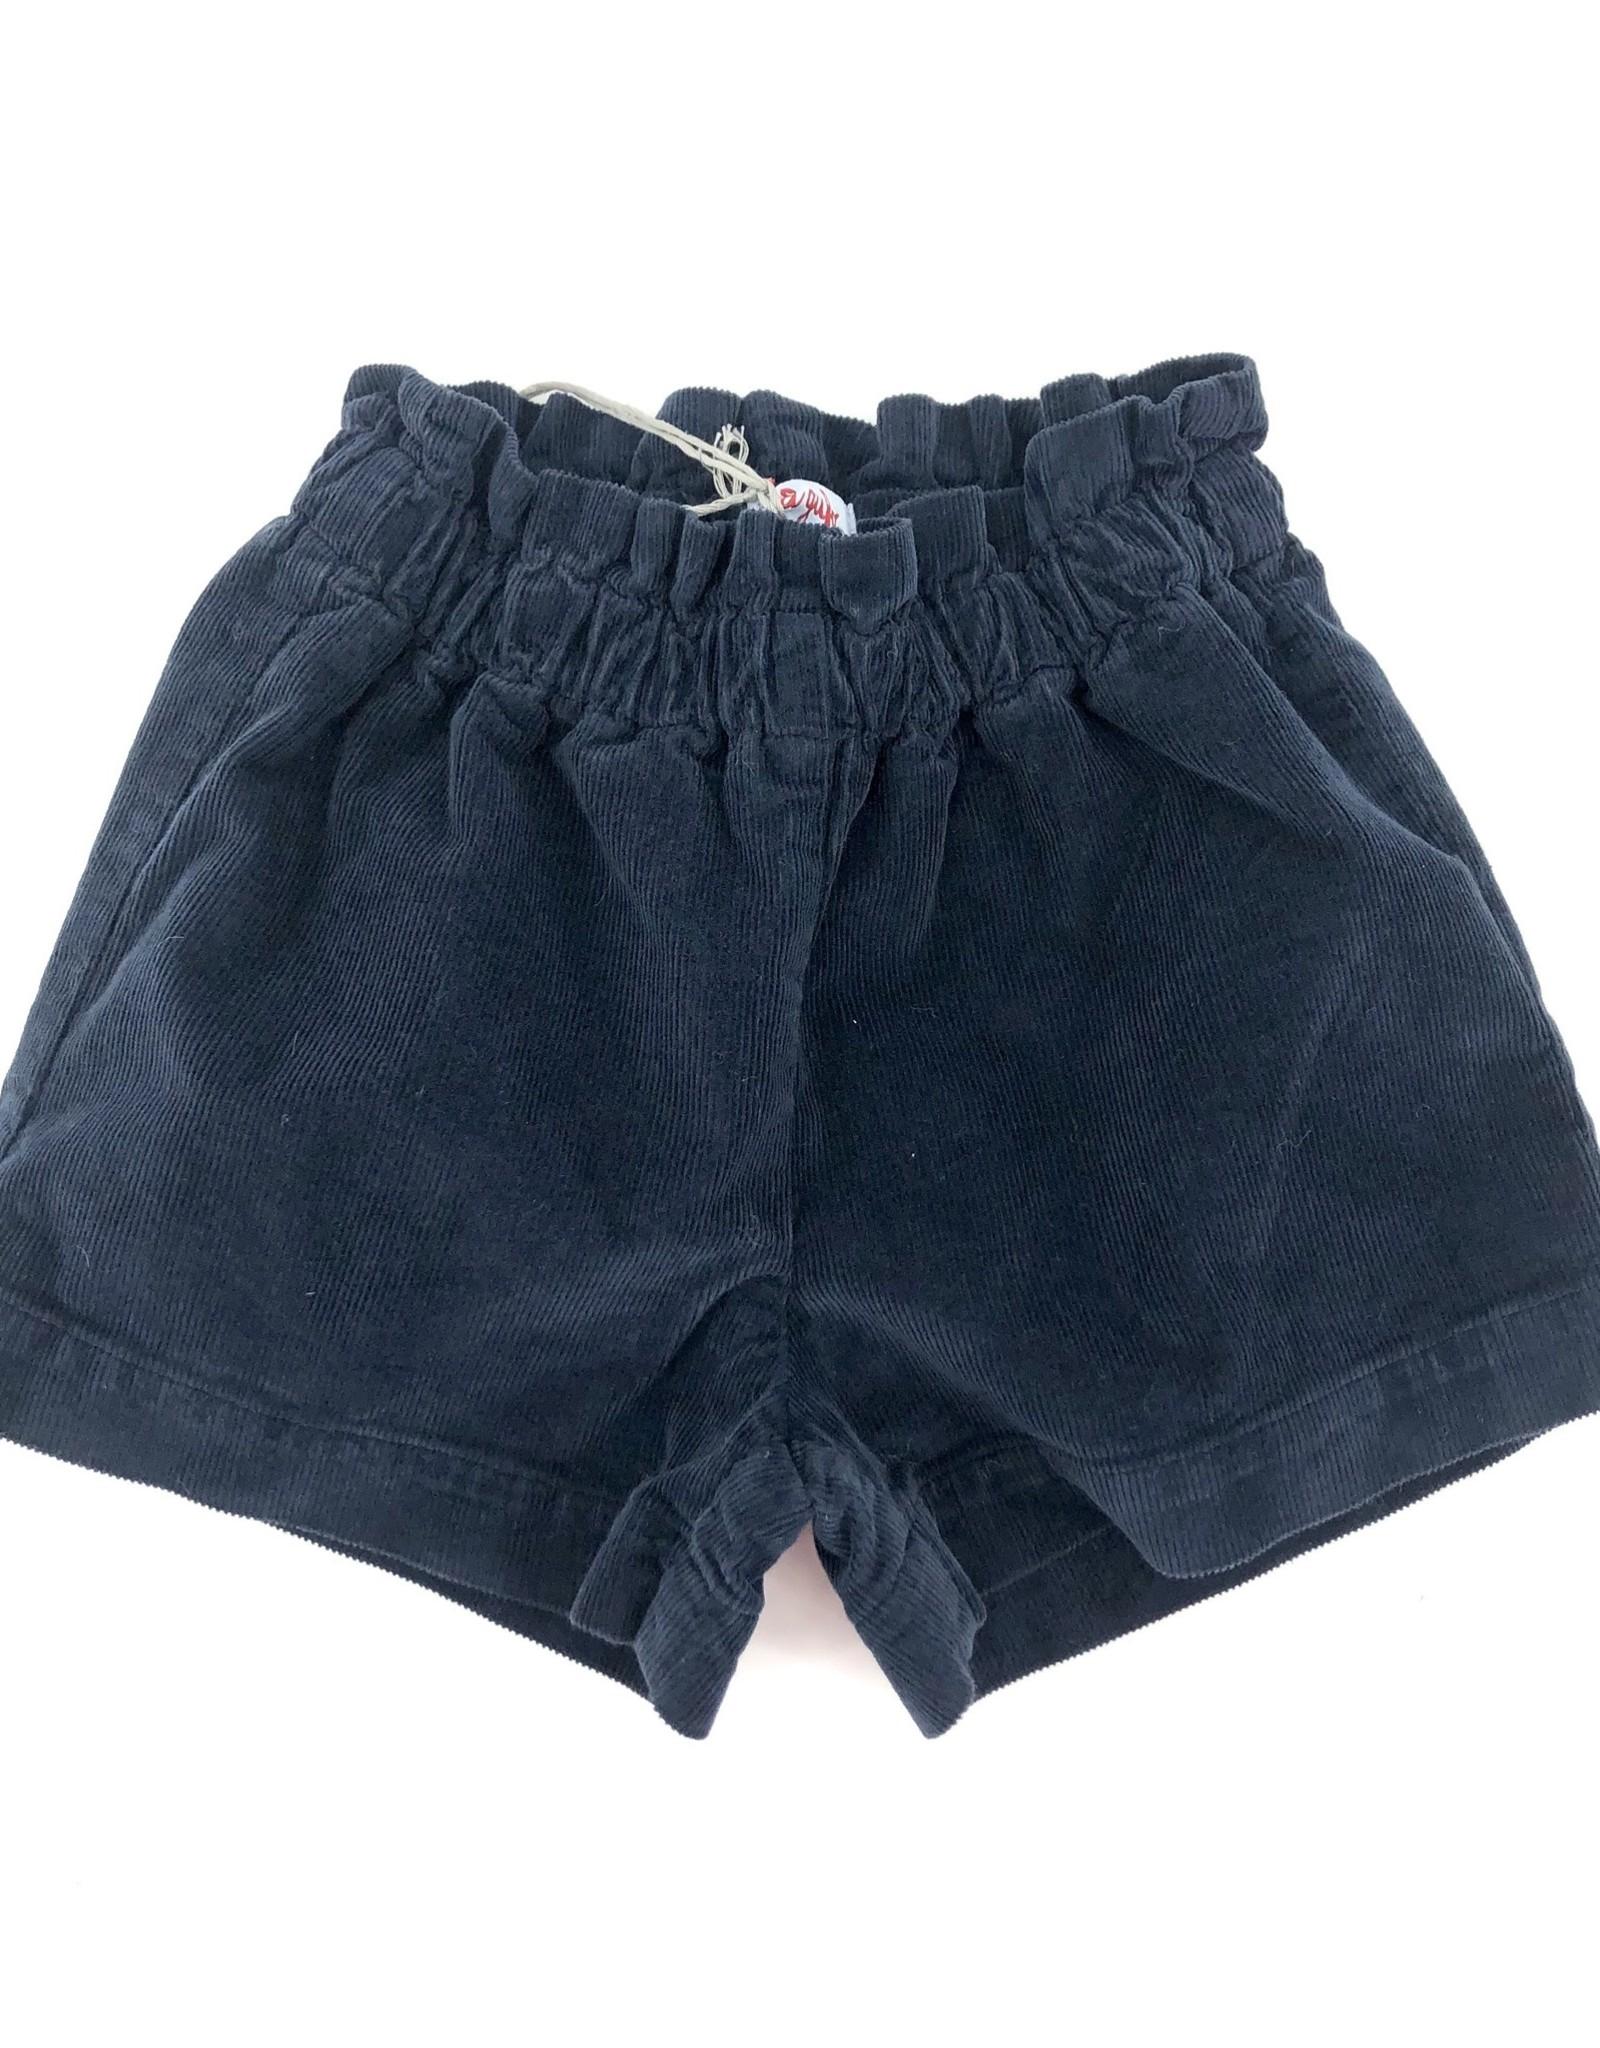 IL GUFO Bermuda Shorts Navy Blue